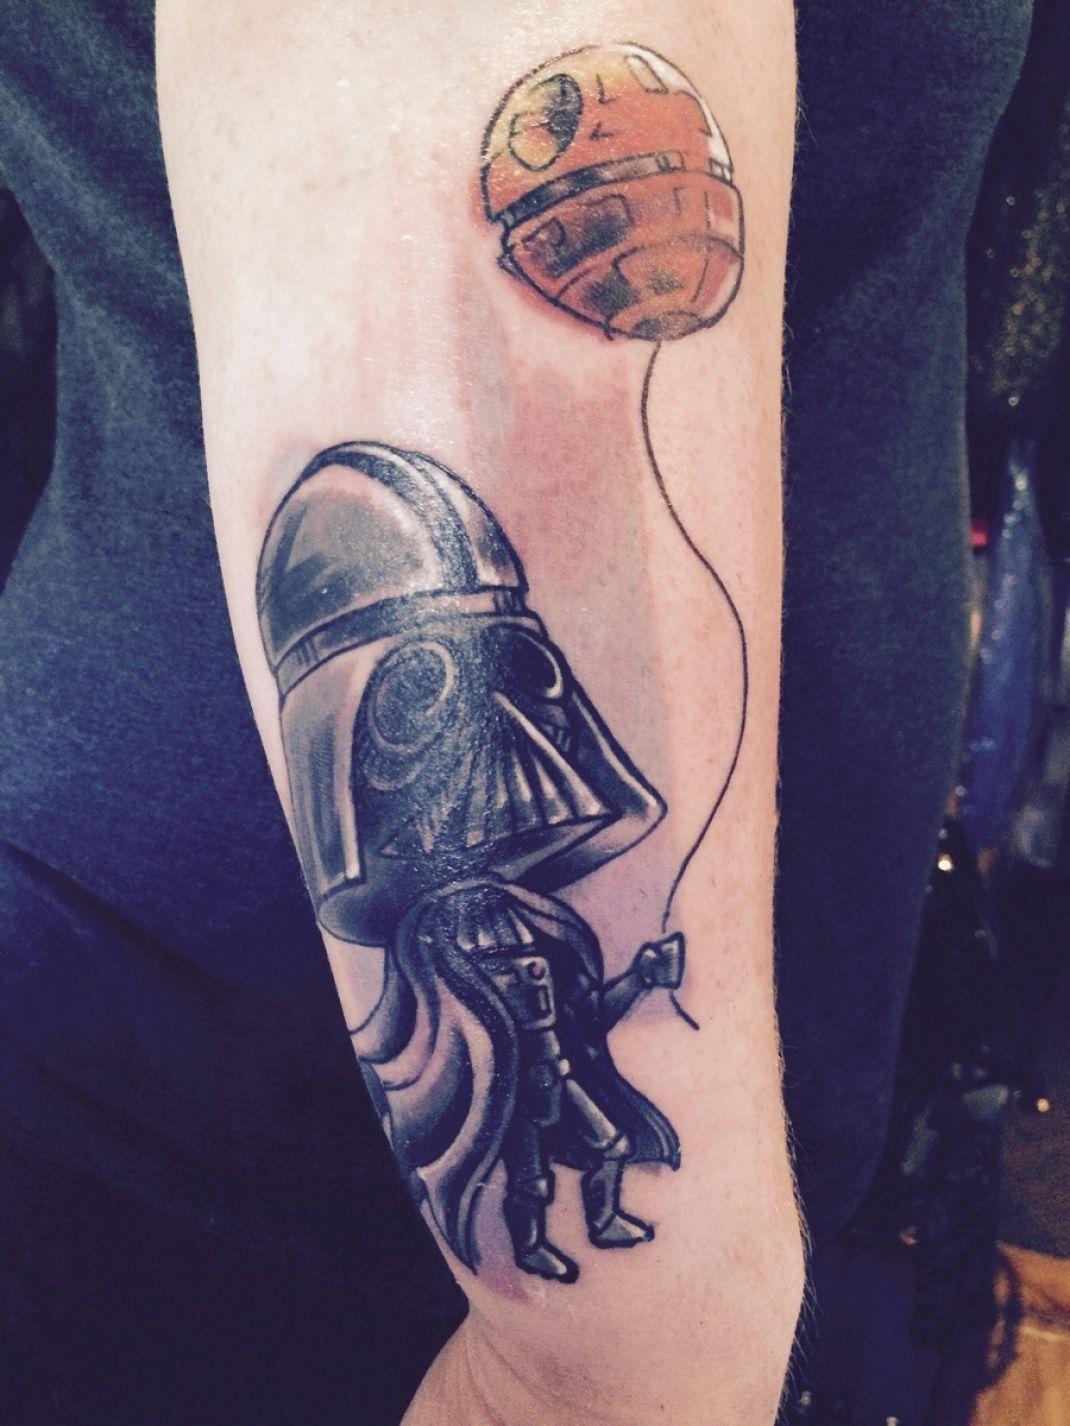 Darth Vader With Death Star Balloon Tattoo